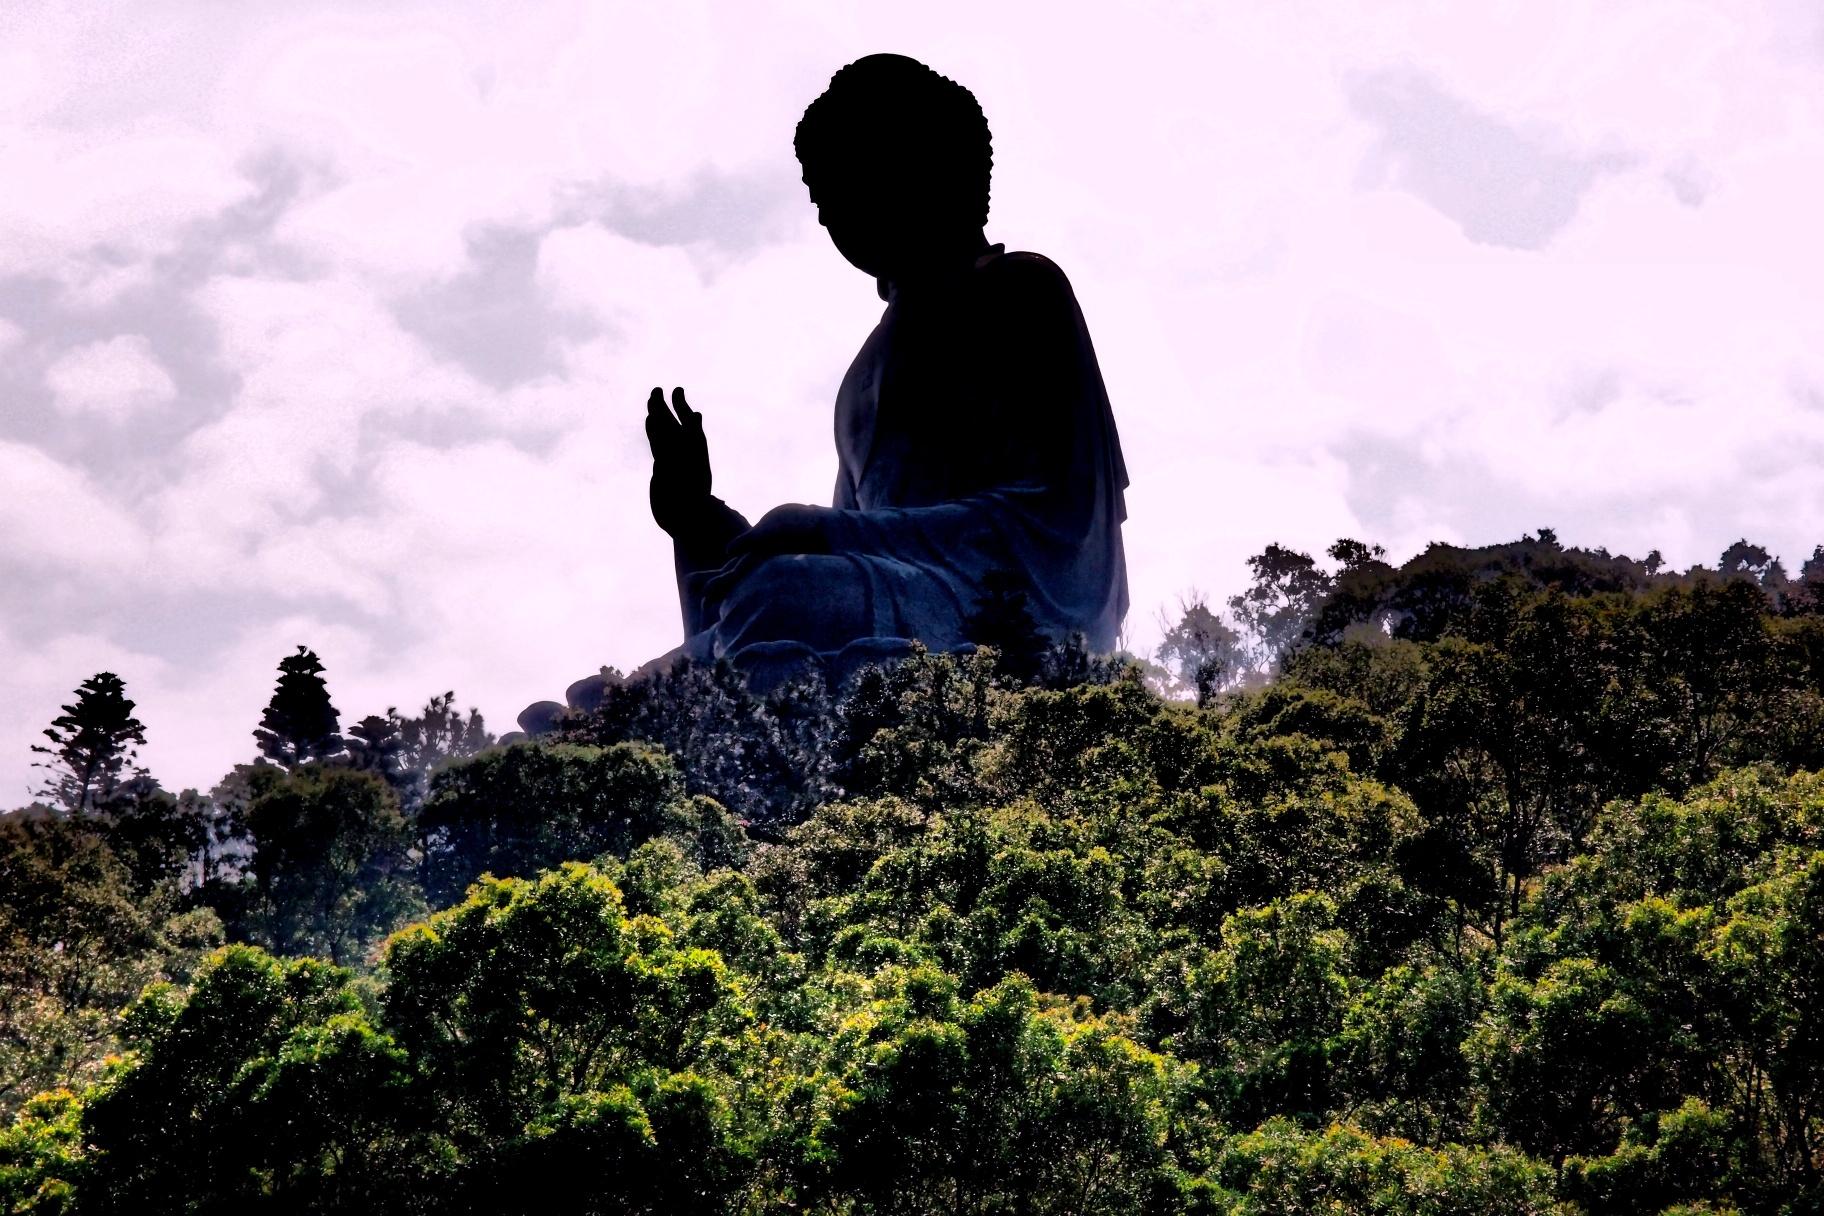 The Giant Buddha on Lantau Island